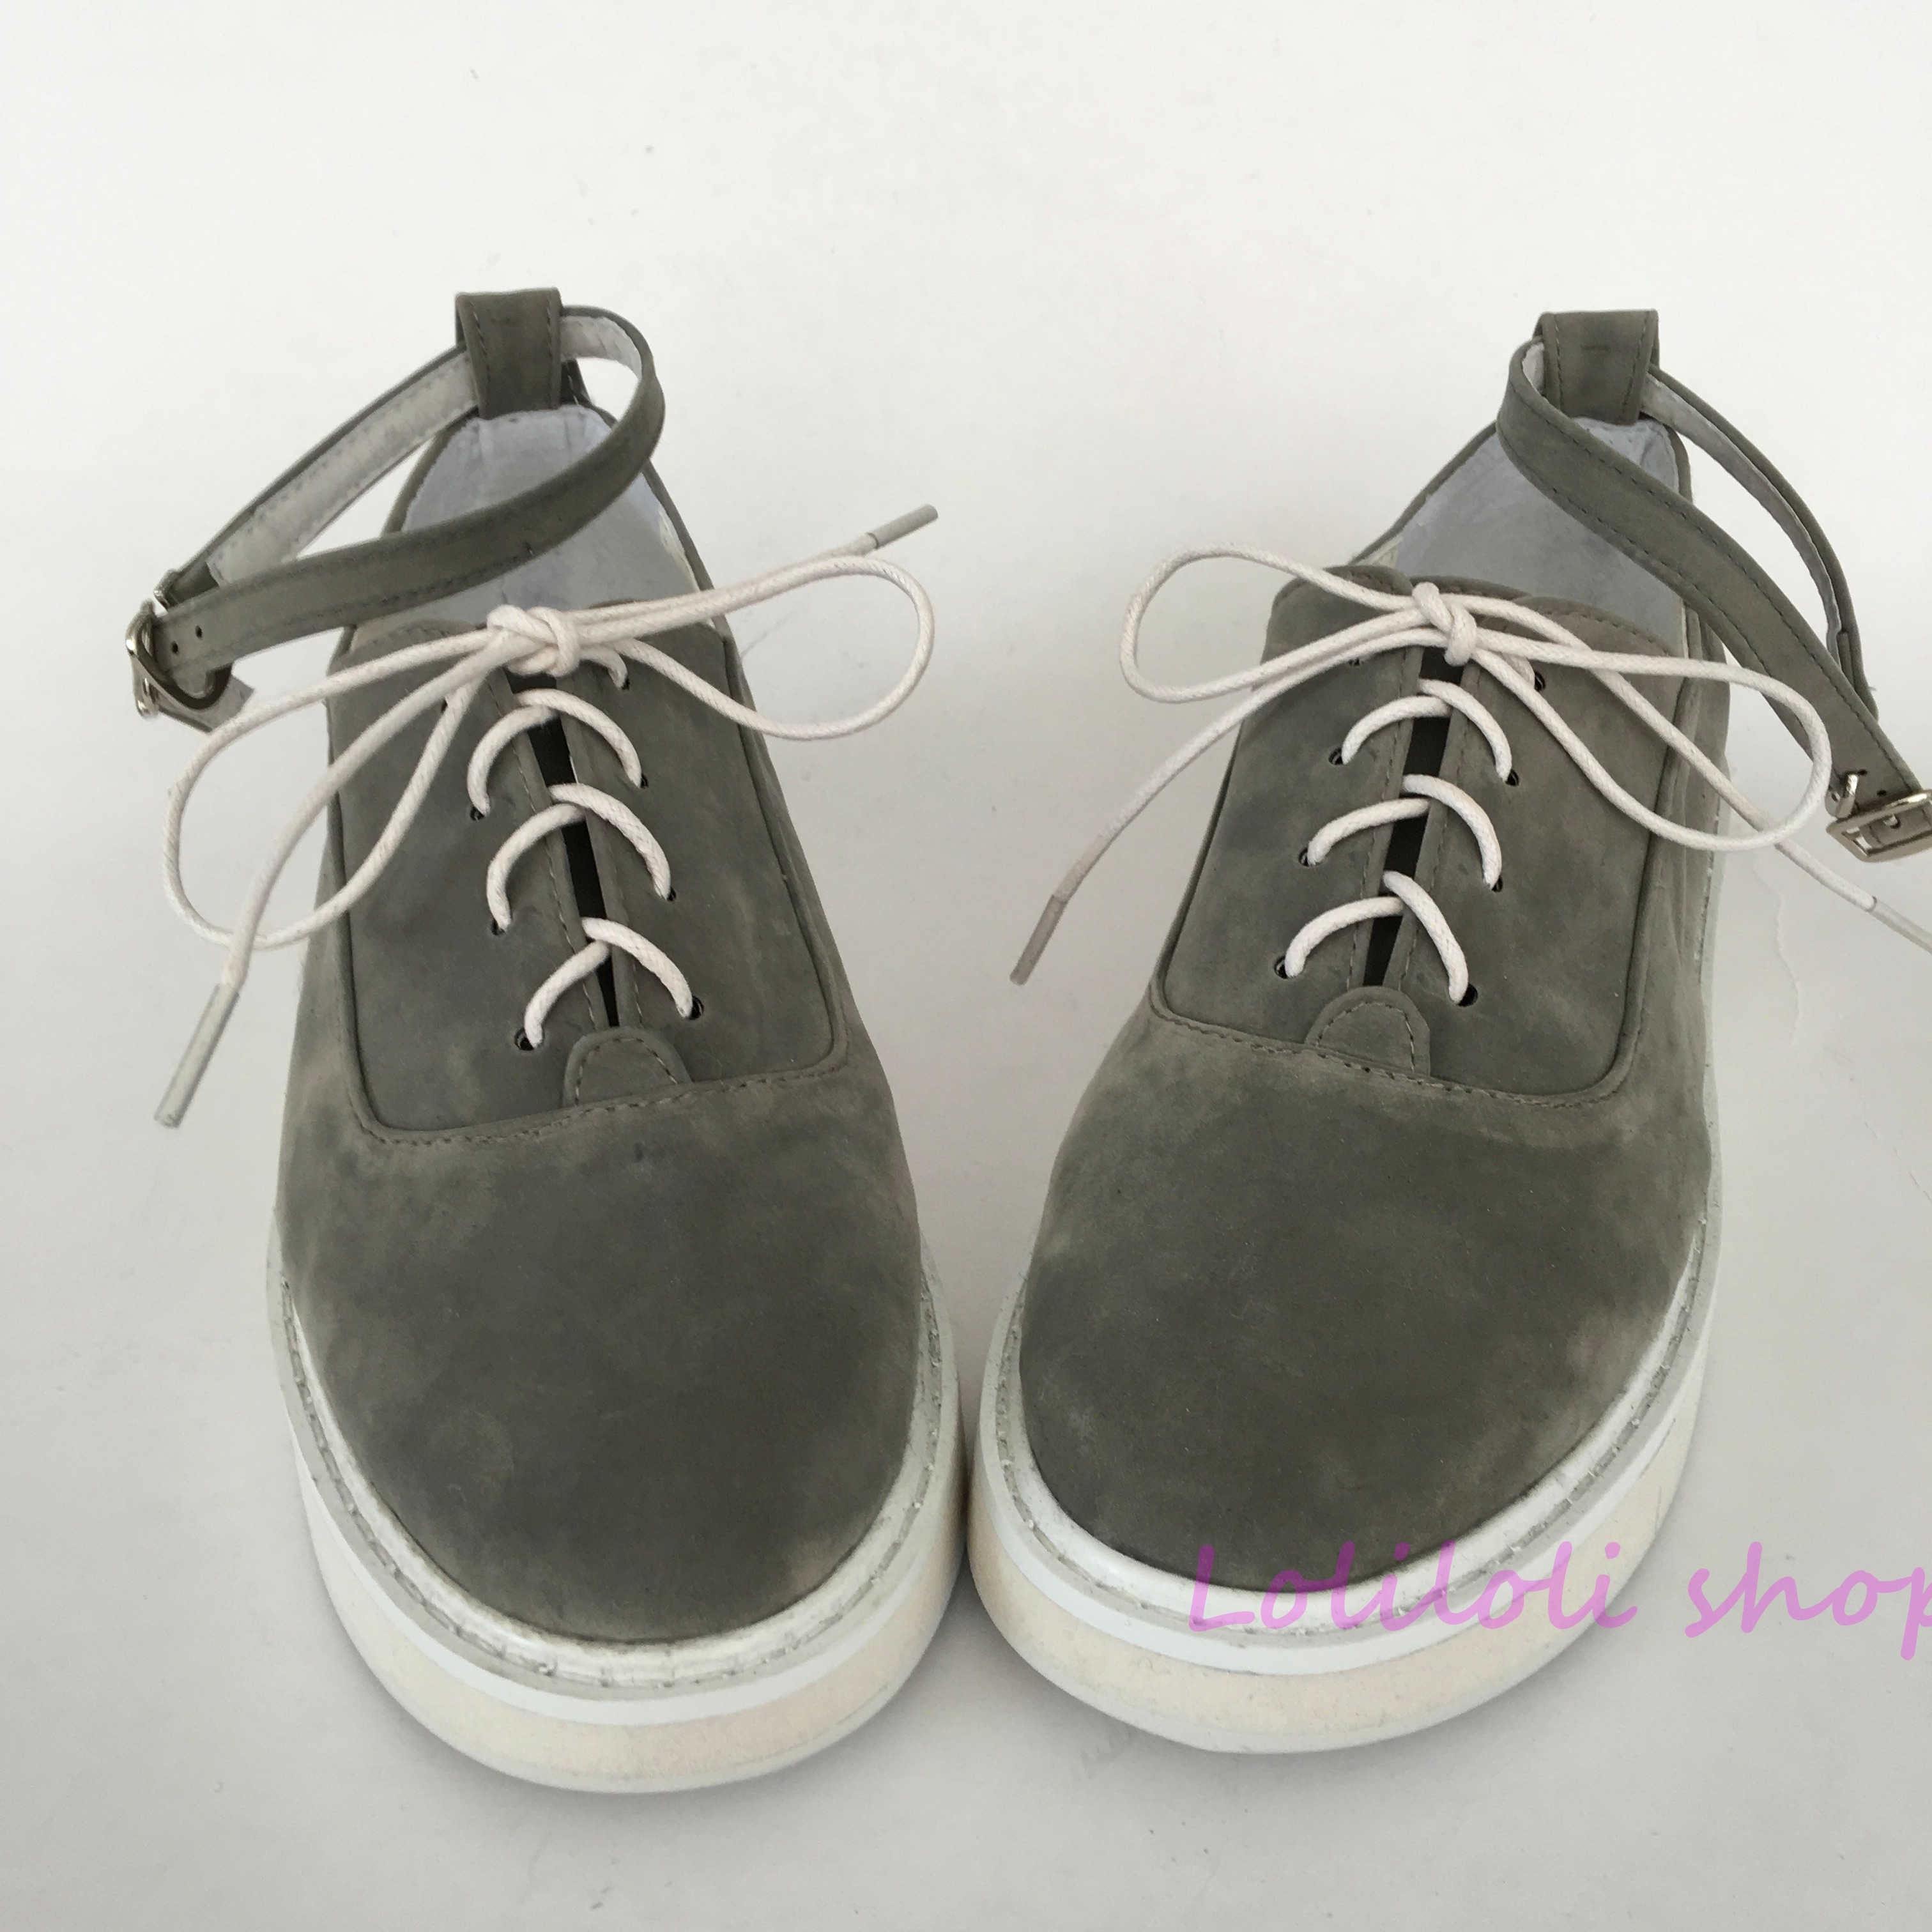 Princesa lolita zapatos grises fondo blanco gamuza Muffin inferior hebilla cinturón personalizado zapatos de gran tamaño hecho a mano an1284